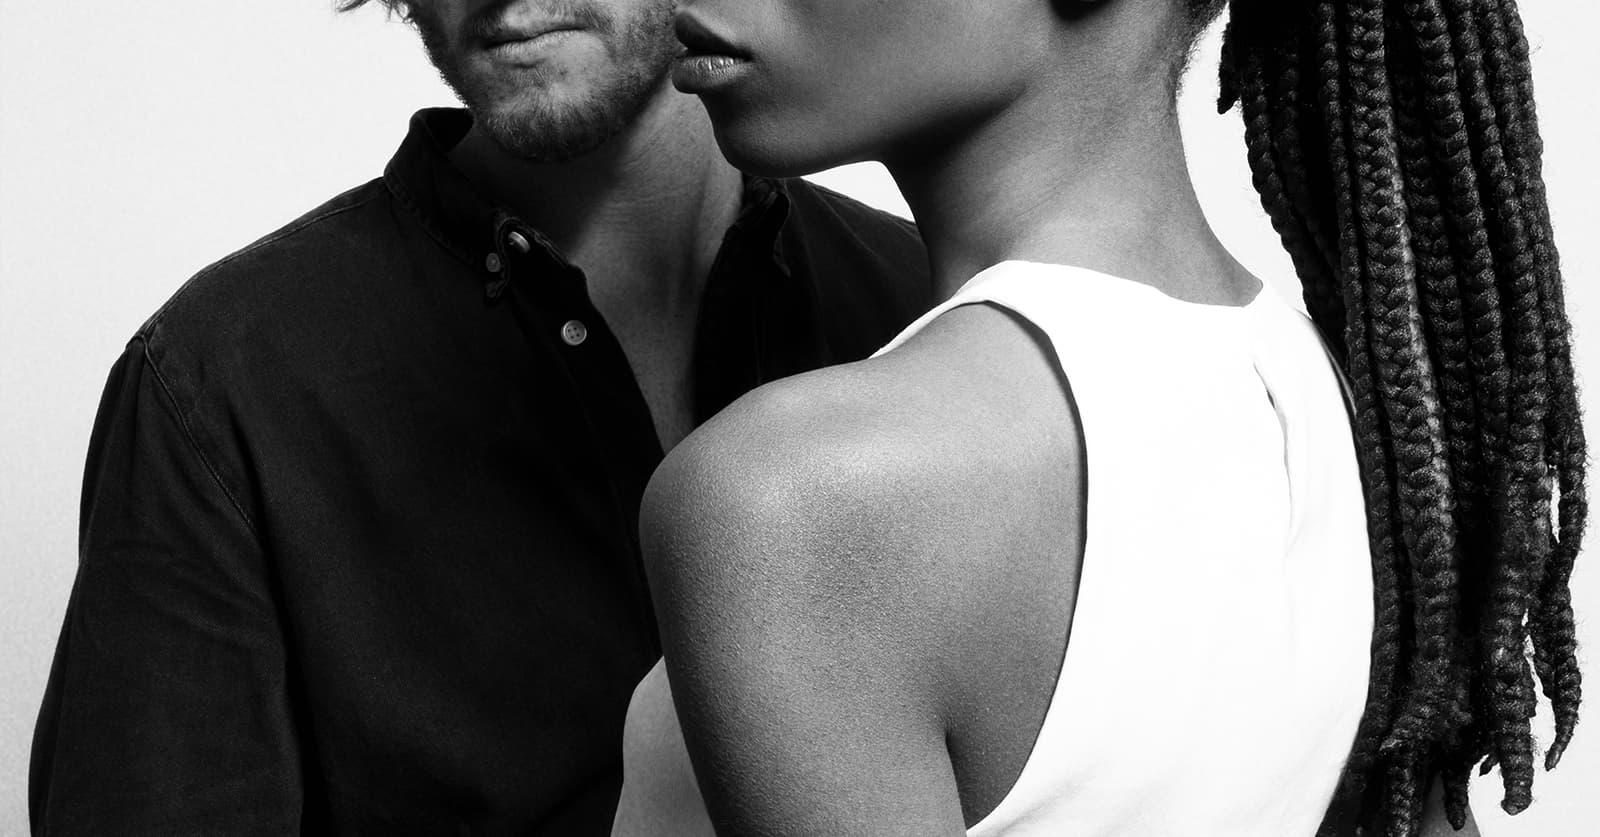 eyepetizer-x-mia-burton-man-and-woman-b&w-closeup